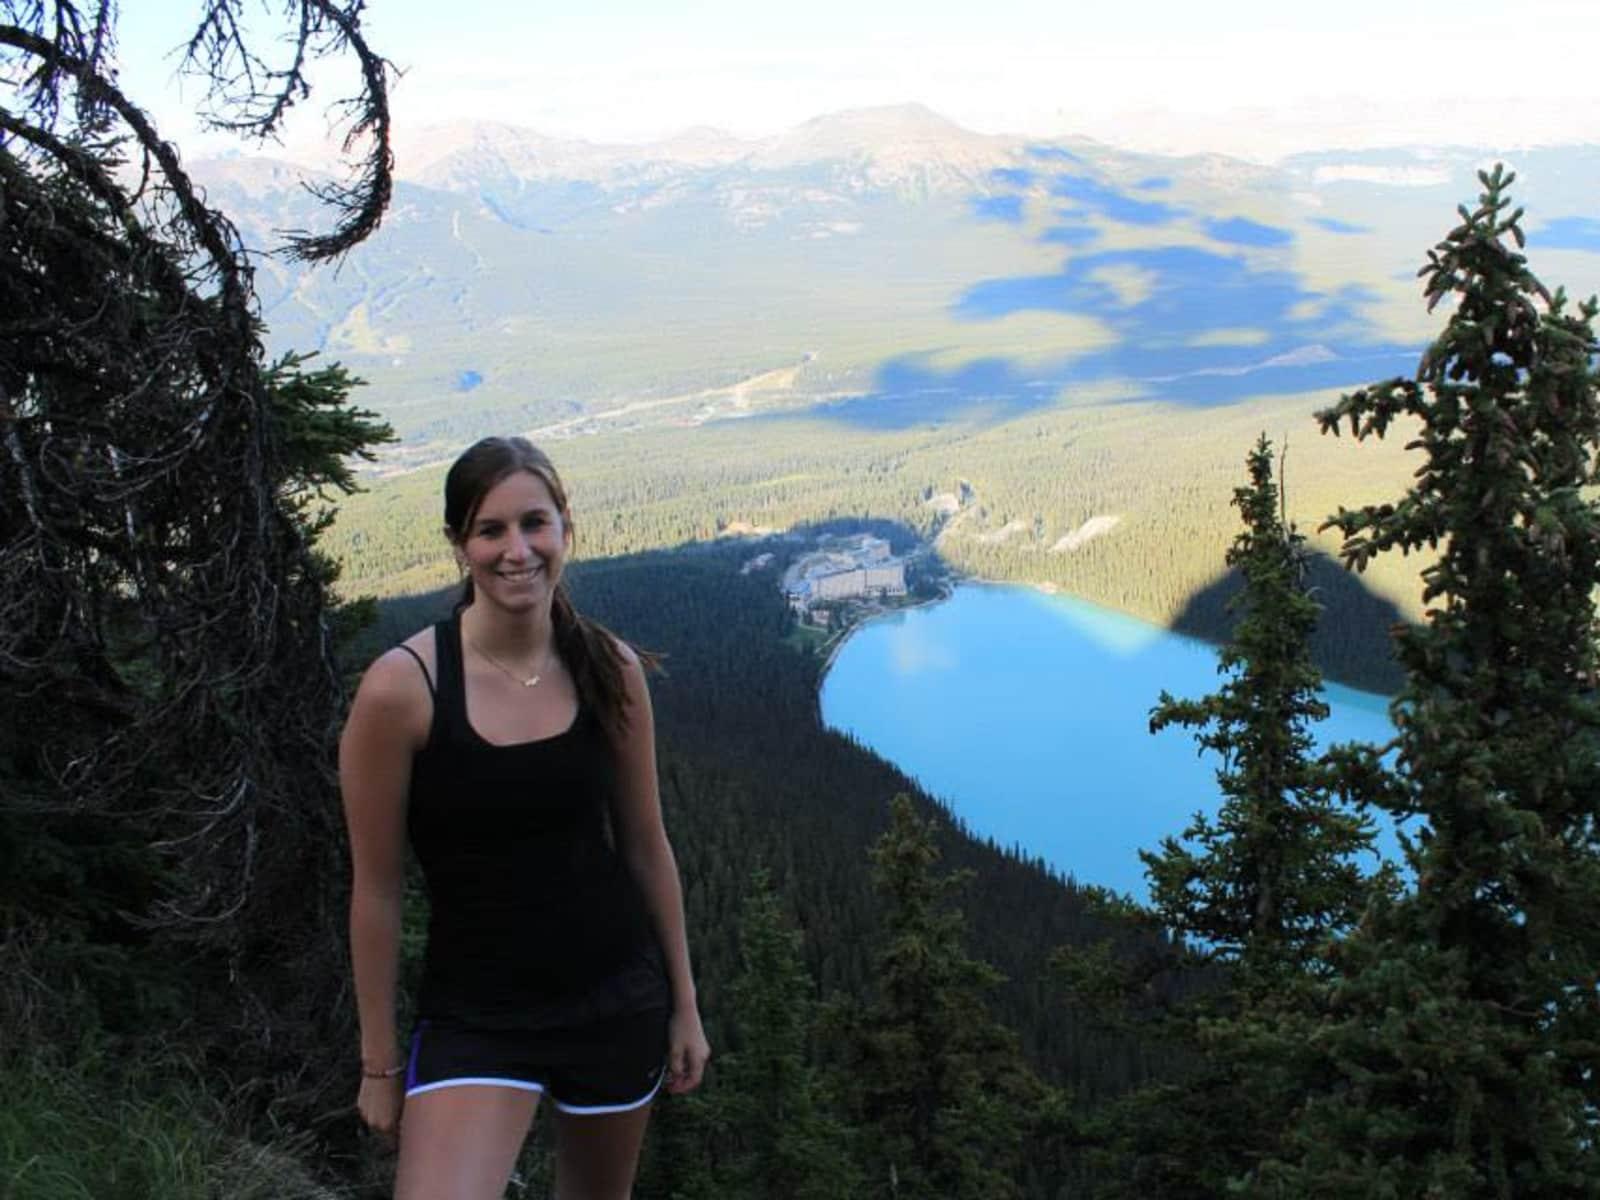 Steph from Calgary, Alberta, Canada